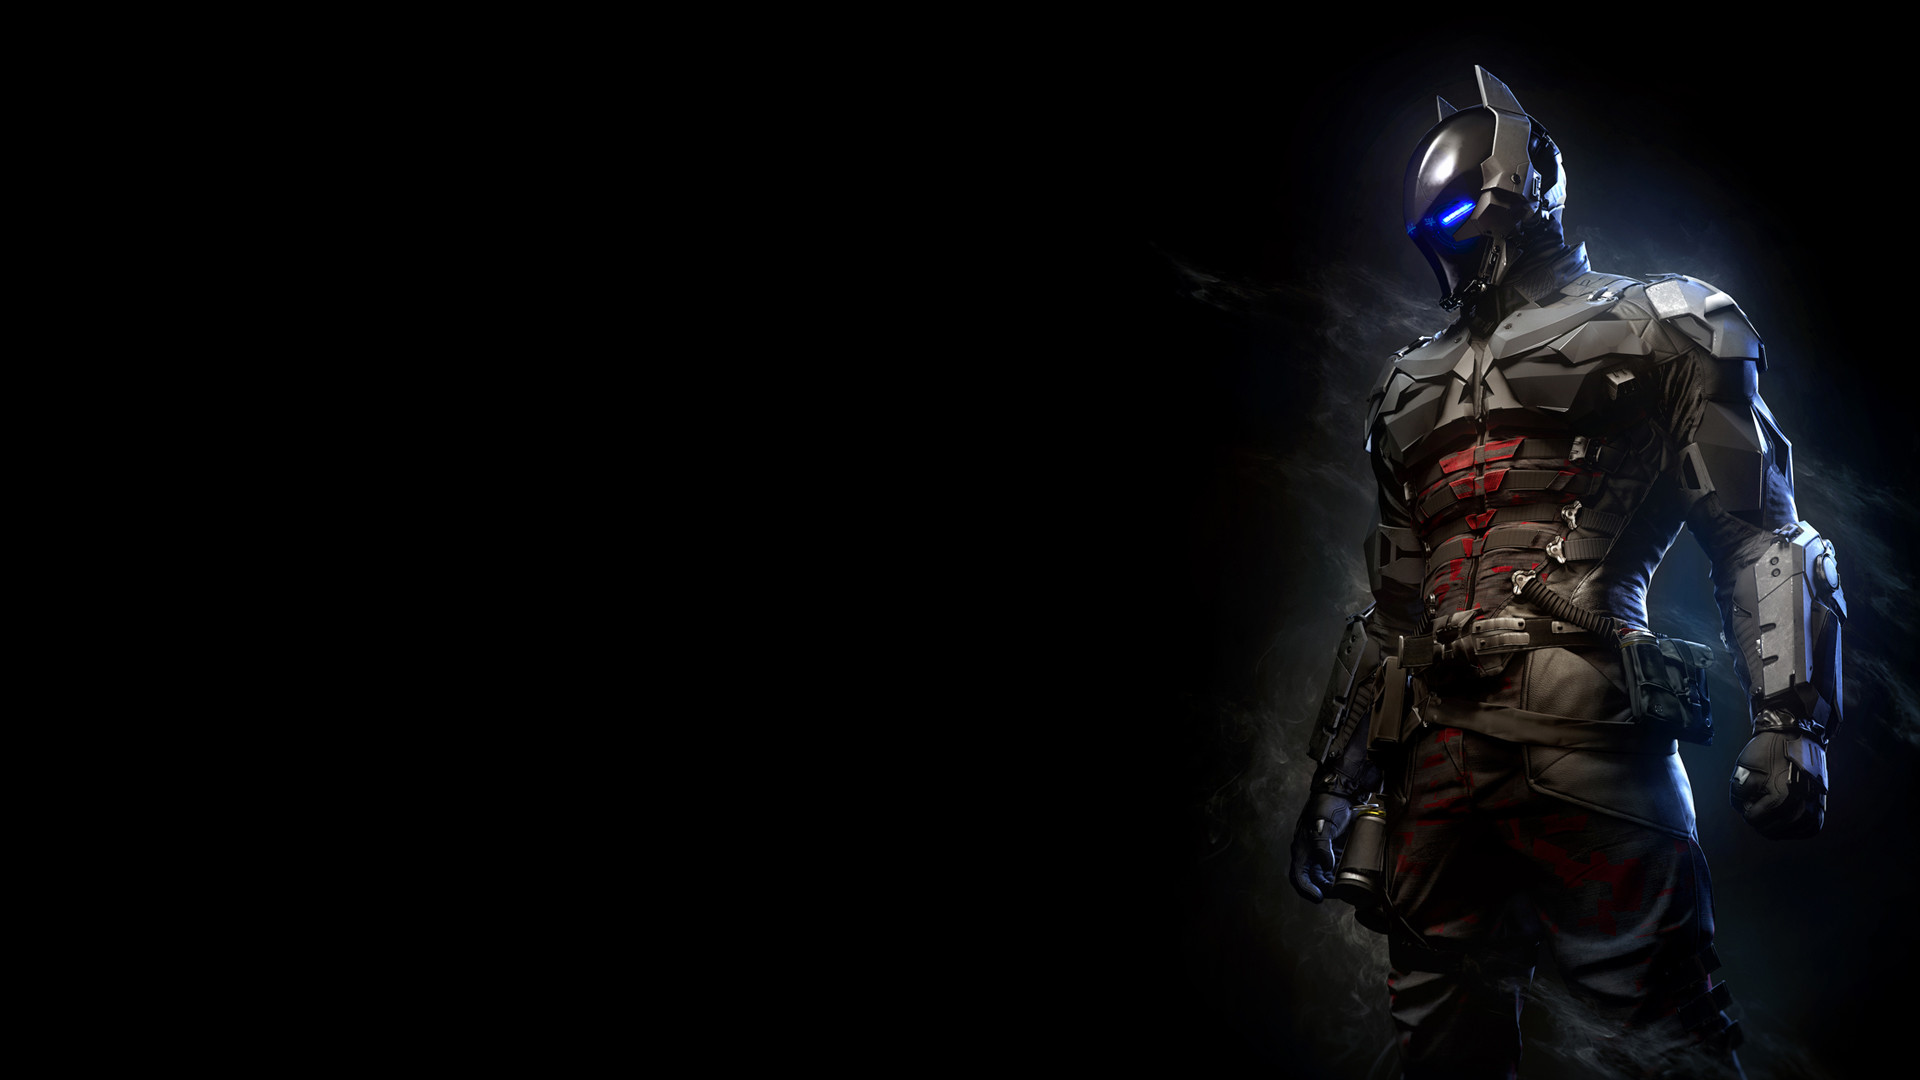 Batman Arkham Knight Wallpaper 15